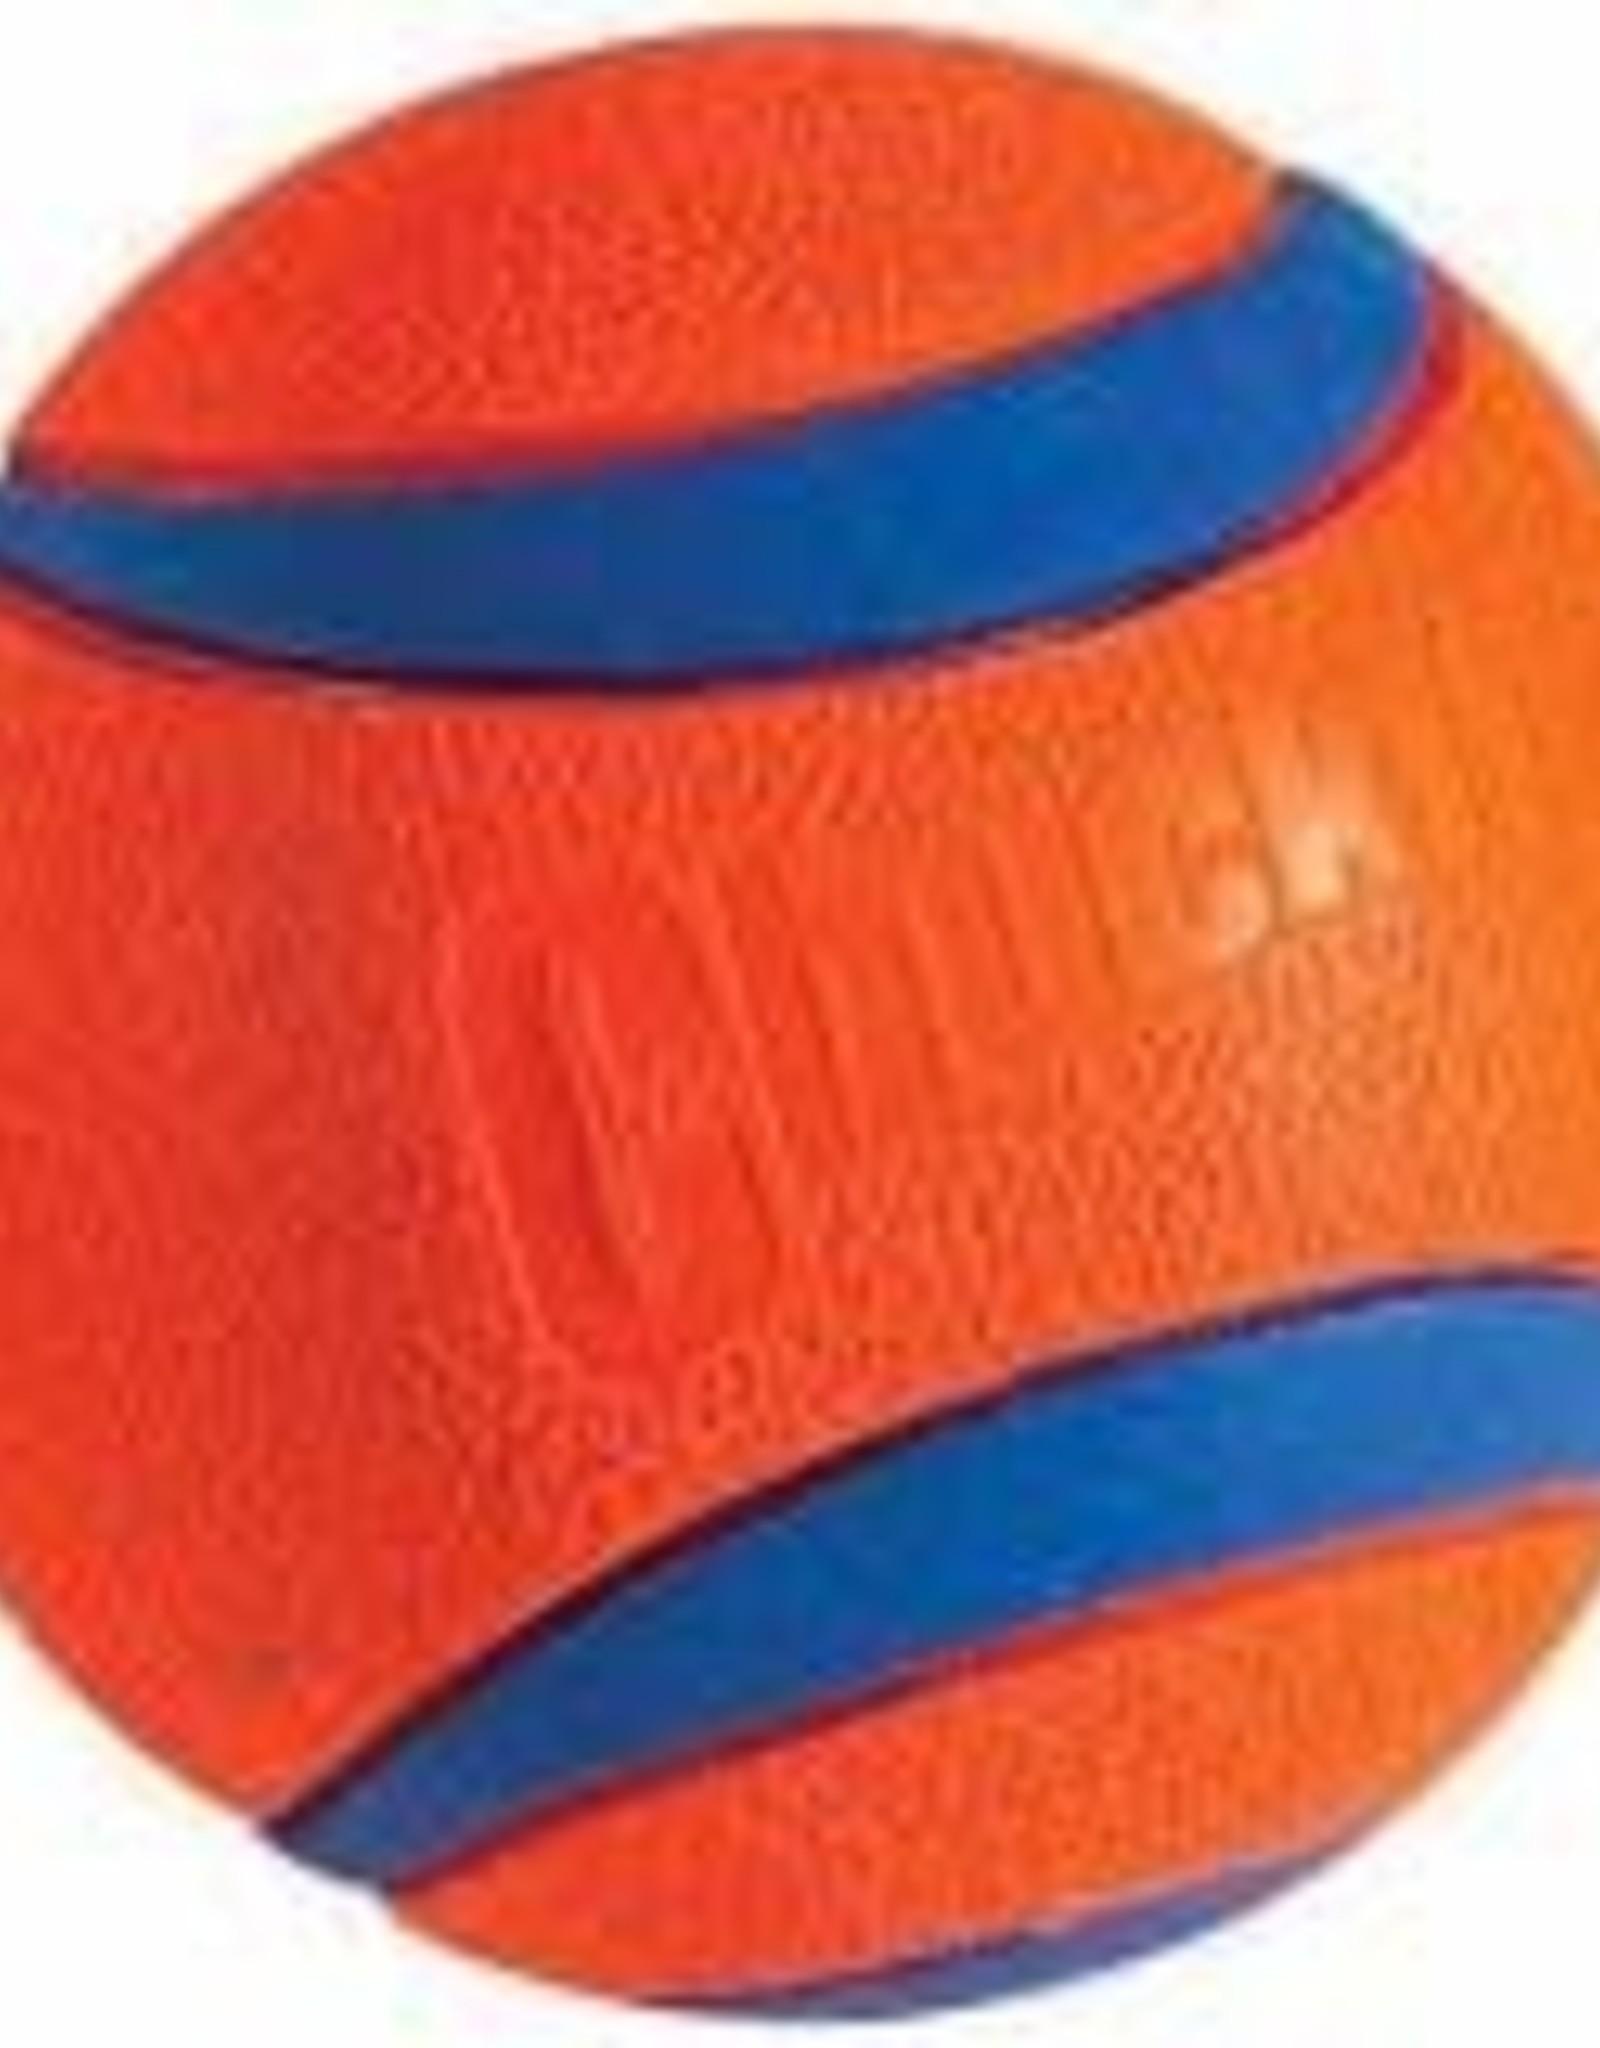 Chuck It! Chuckit Utra Ball LG